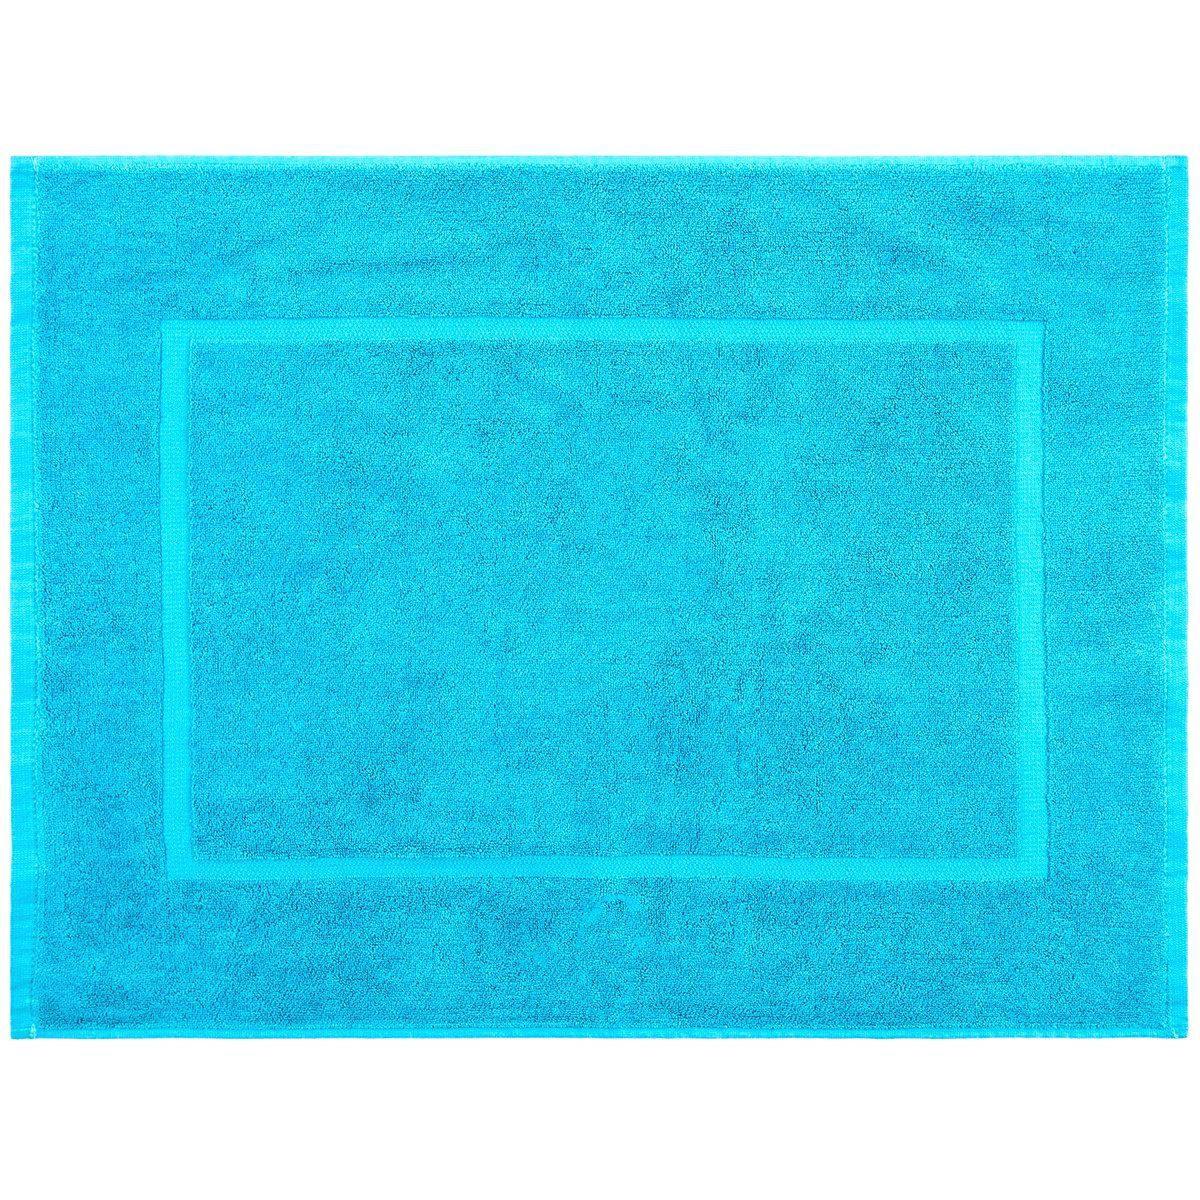 Profod Kúpeľňová predložka Comfort modrá